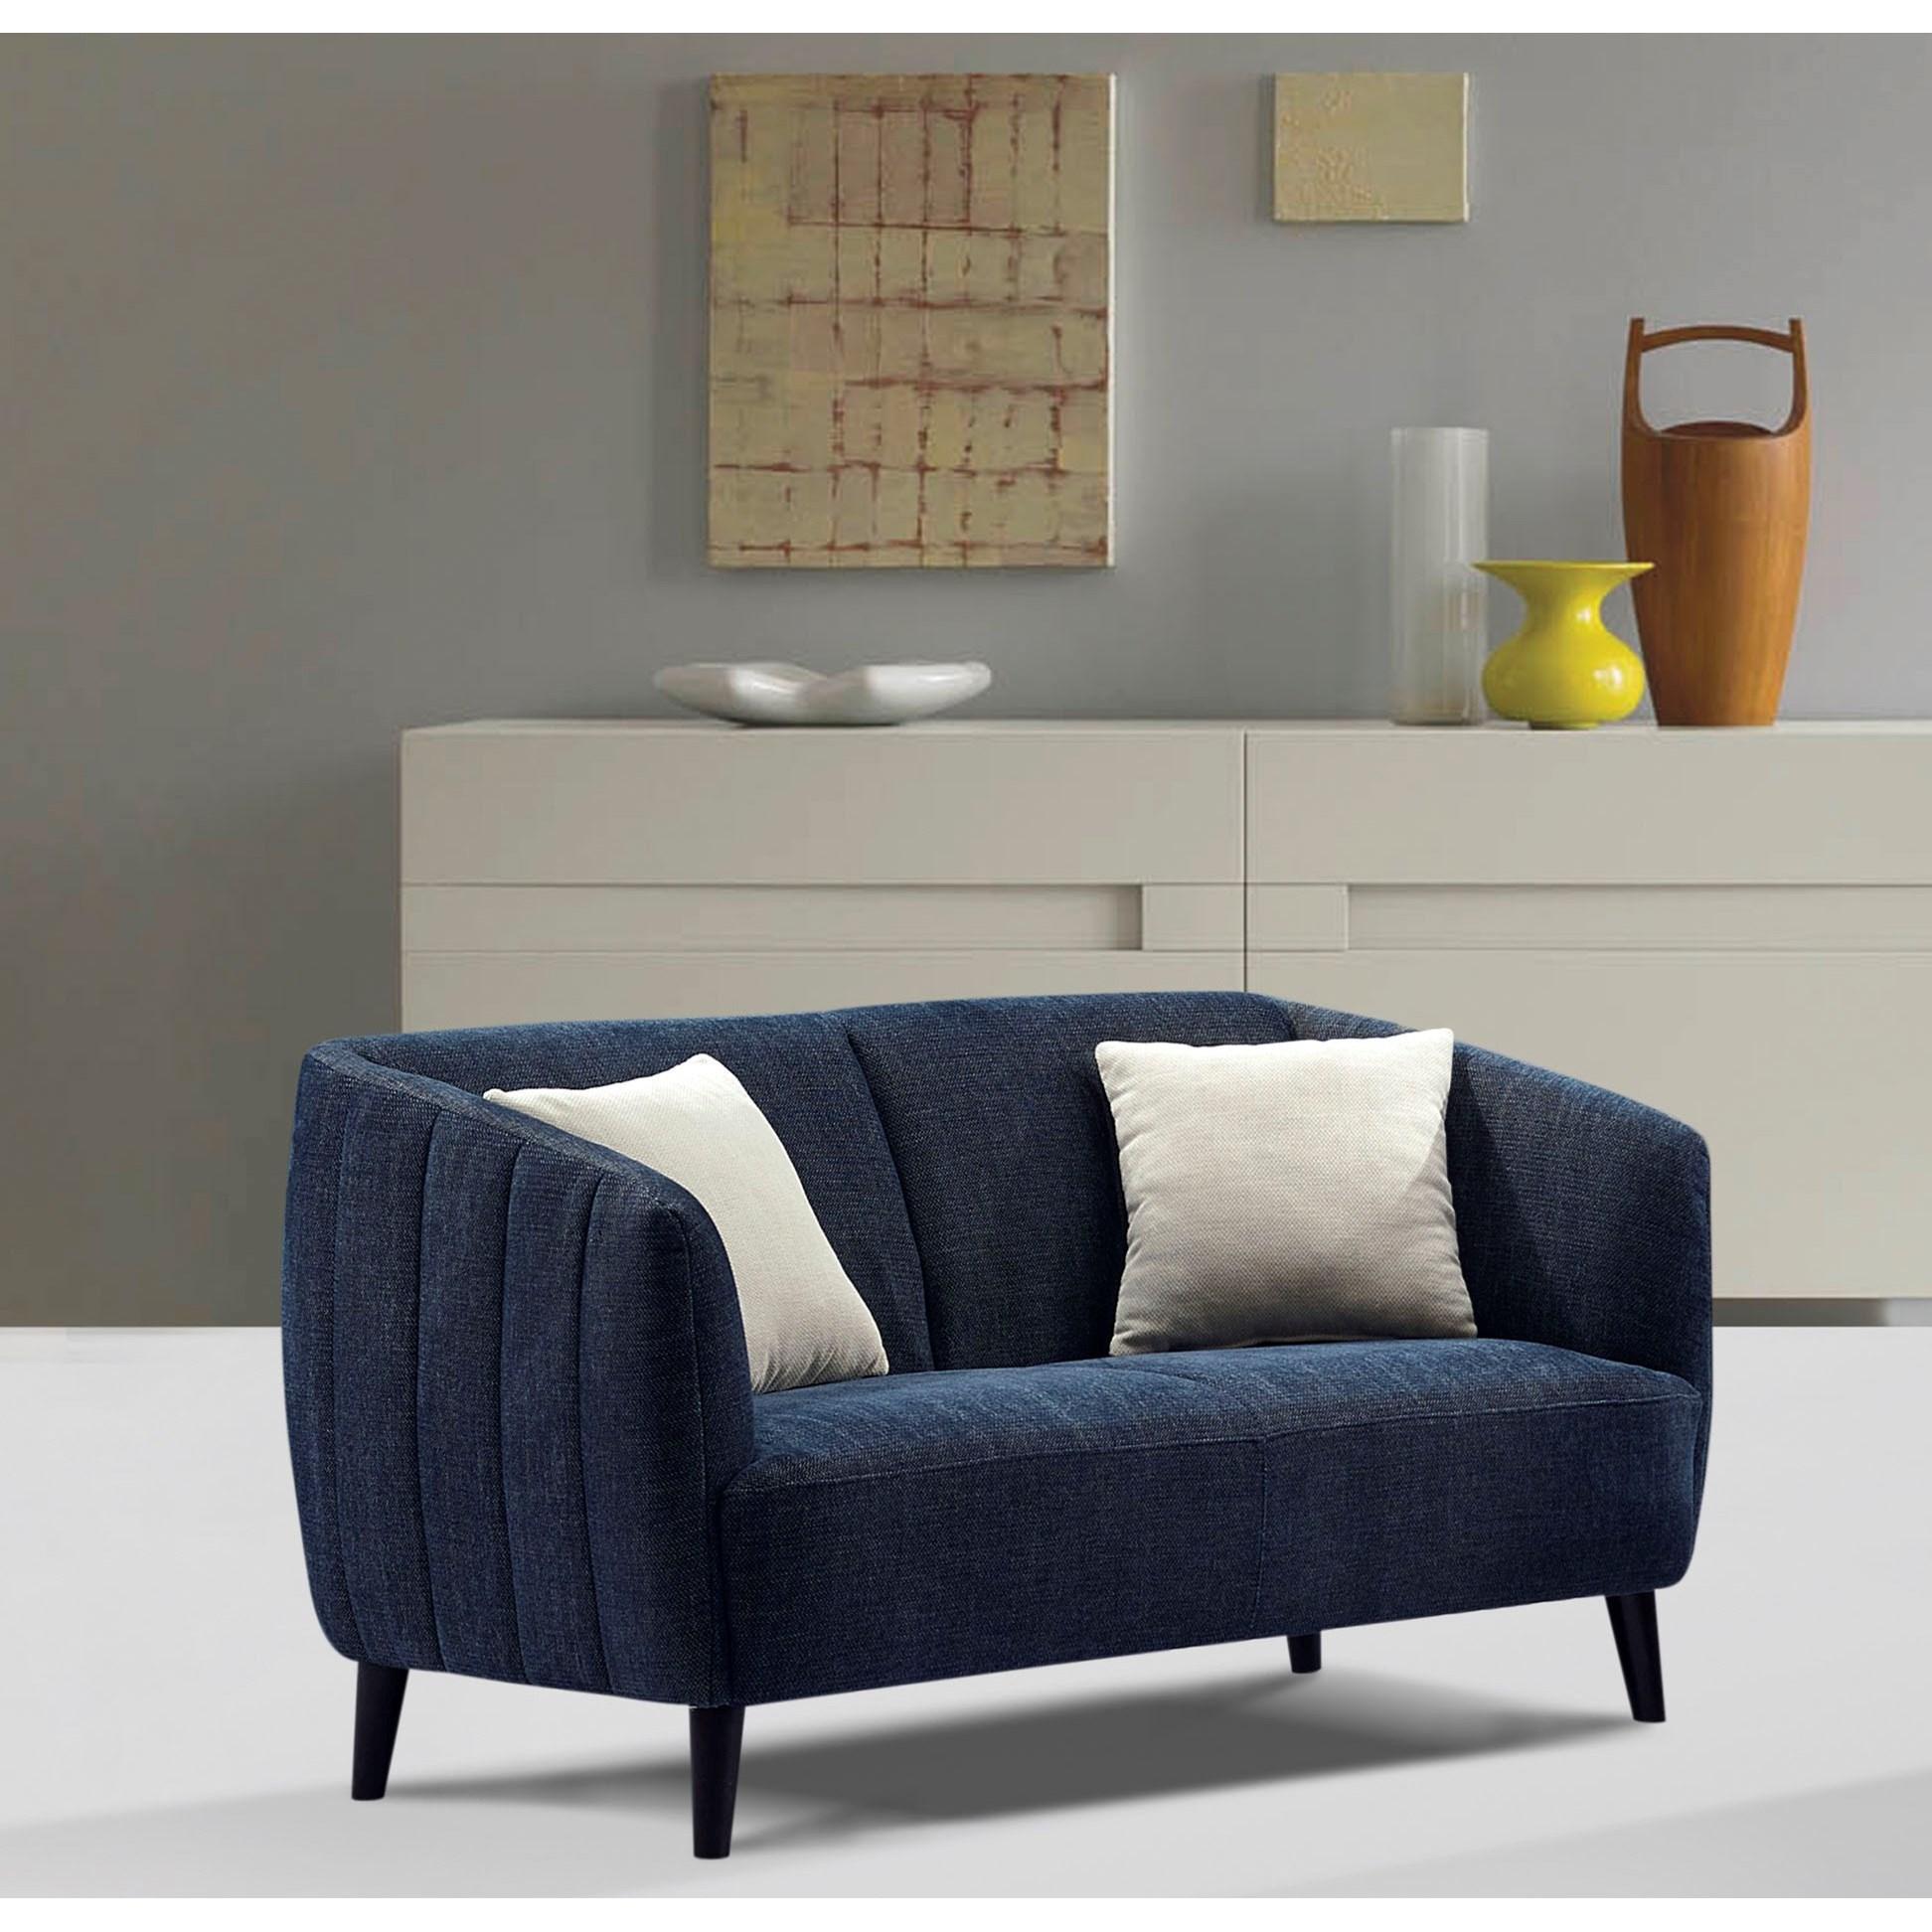 angled sofa legs hadley heirloom charcoal diamond de luca delucalobu modern loveseat with